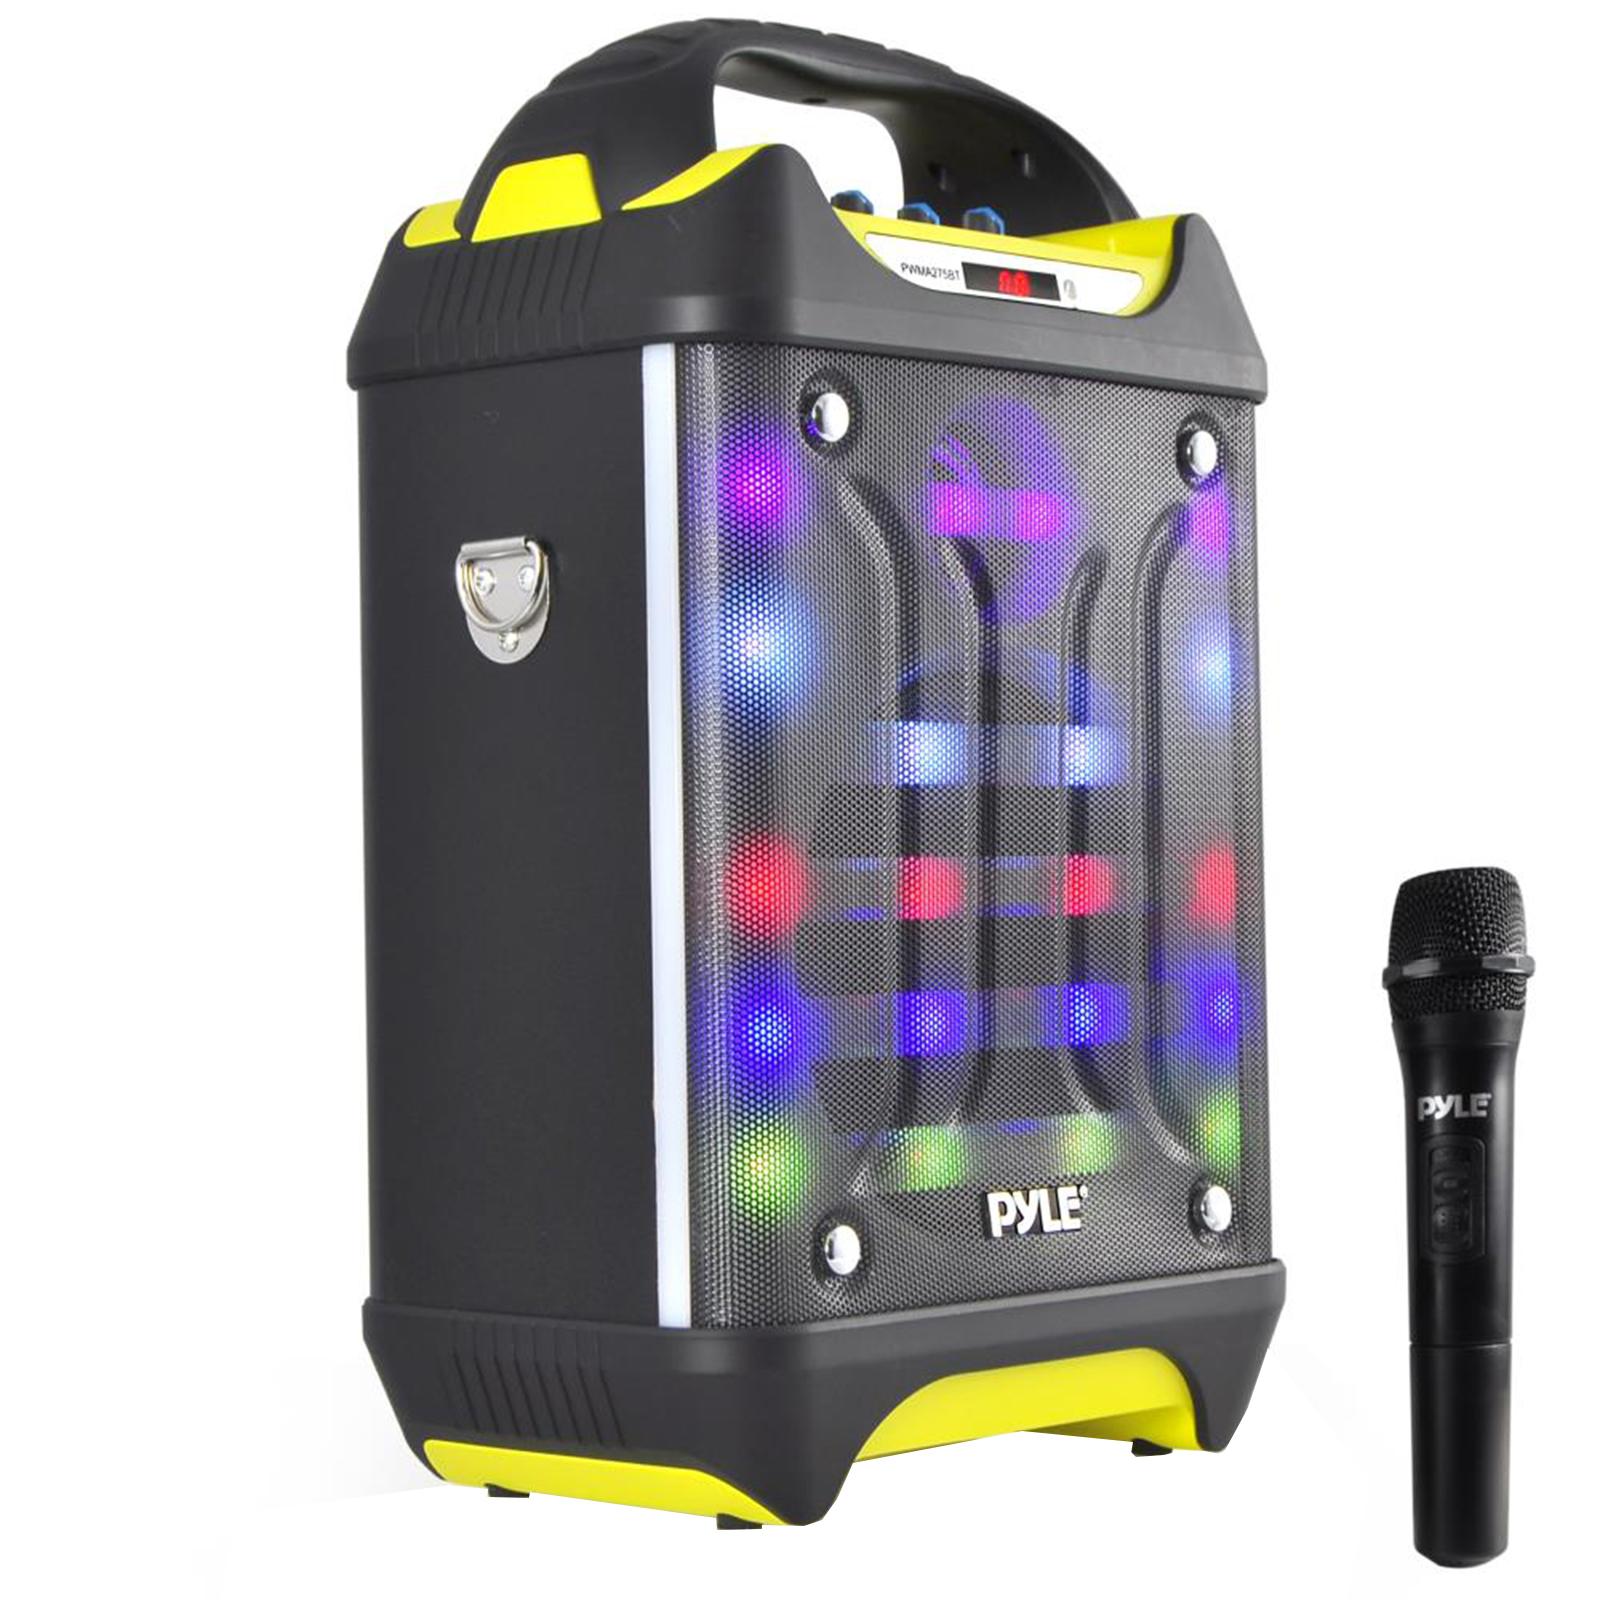 Portable BT Karaoke Speaker System, Flashing DJ Lights, Microphone, Recording Ability, MP3/USB/SD/FM Radio